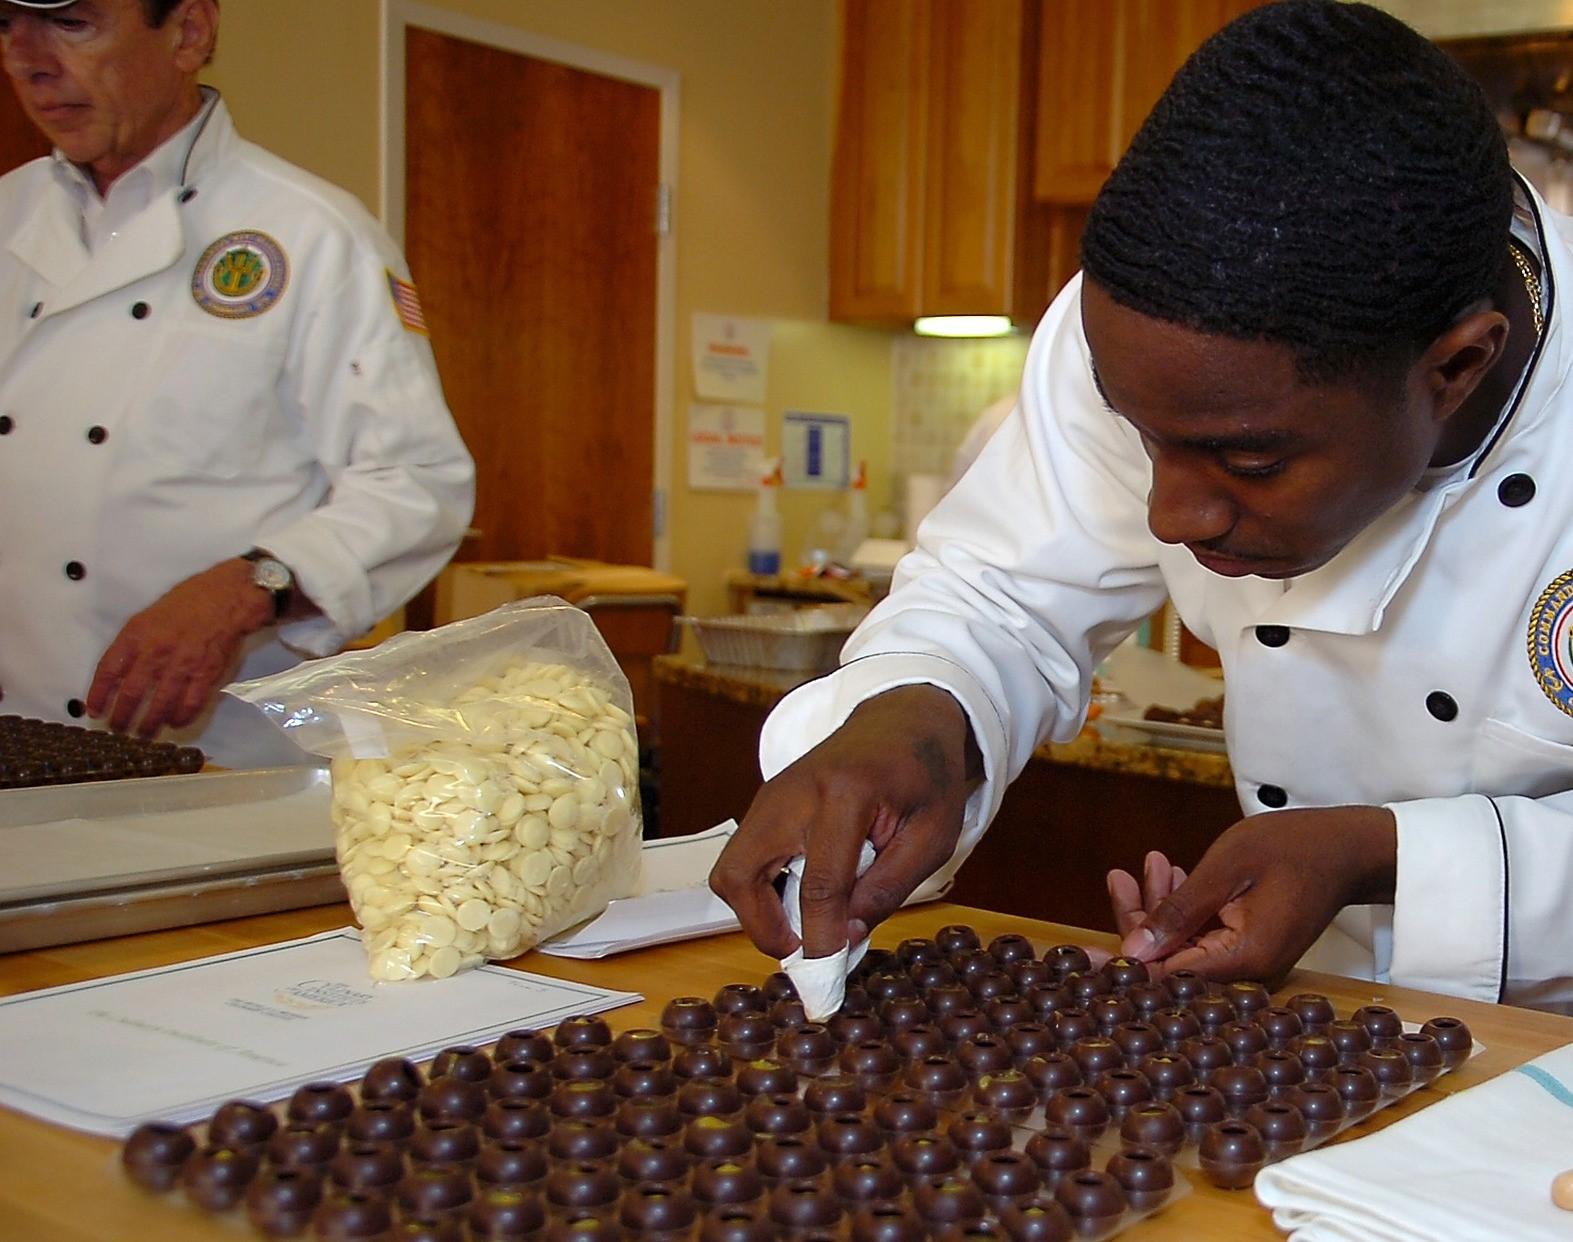 Training chefs